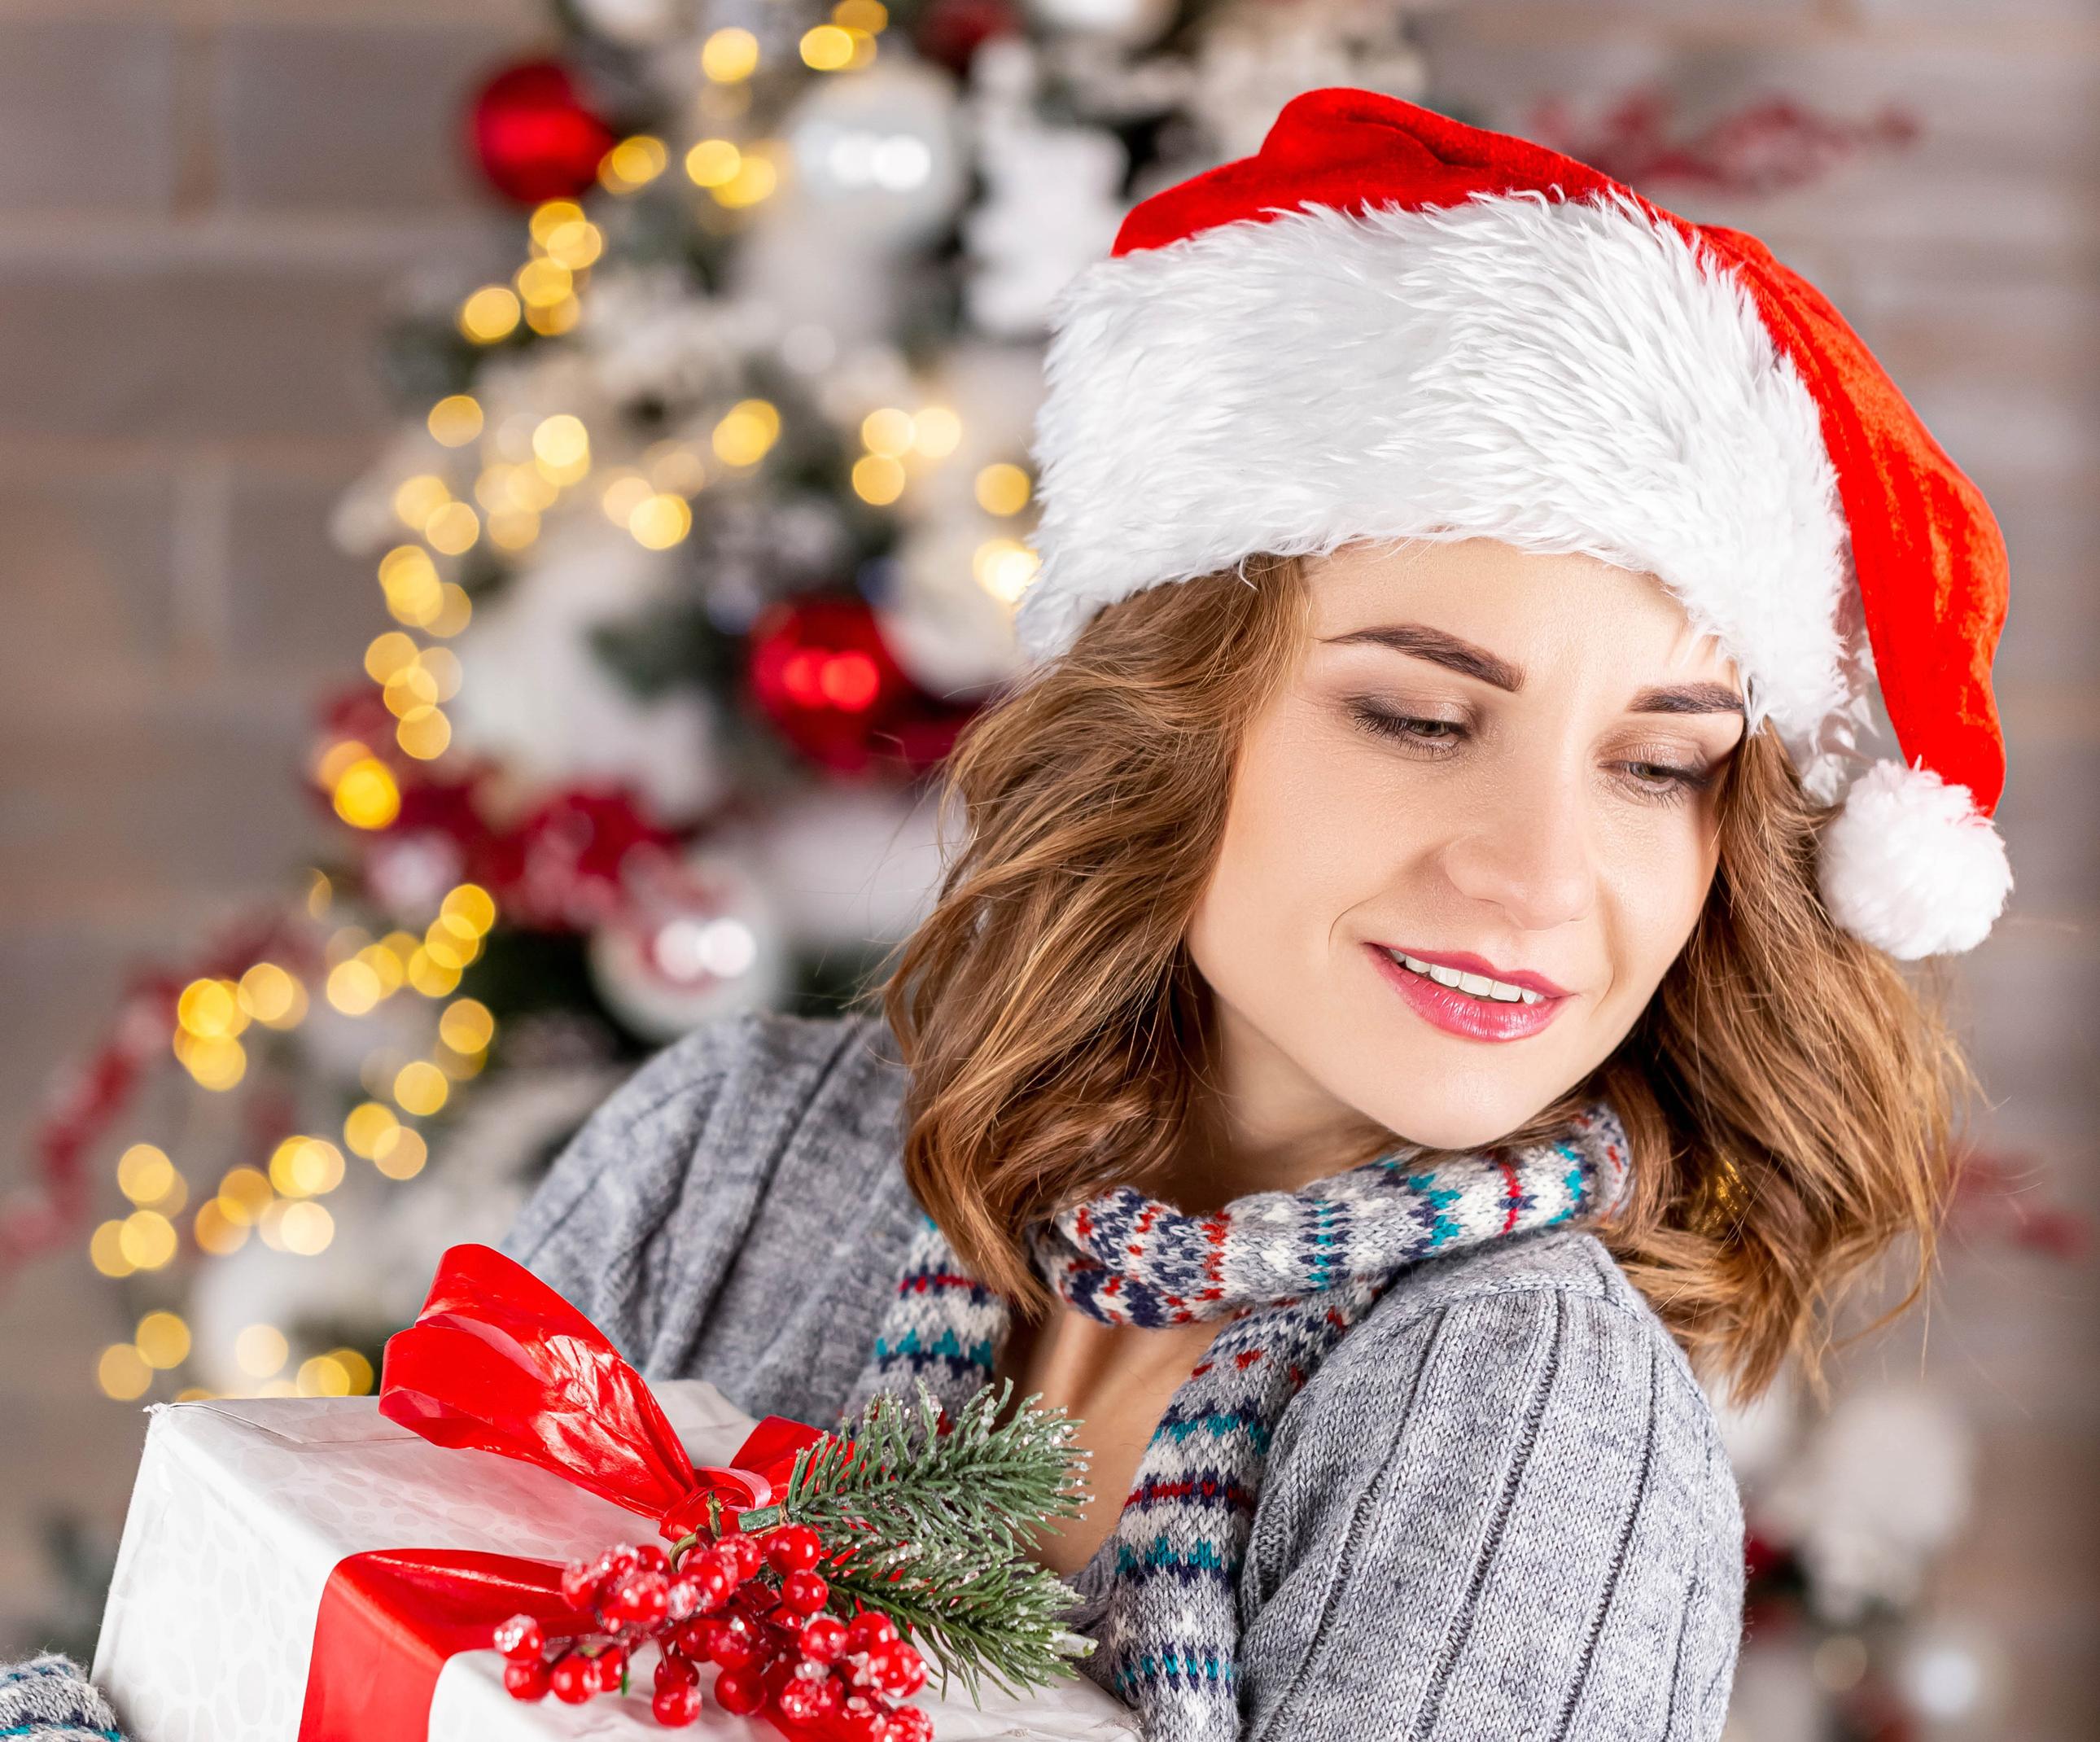 Woman Santa Hat Gift Brunette 2580x2140